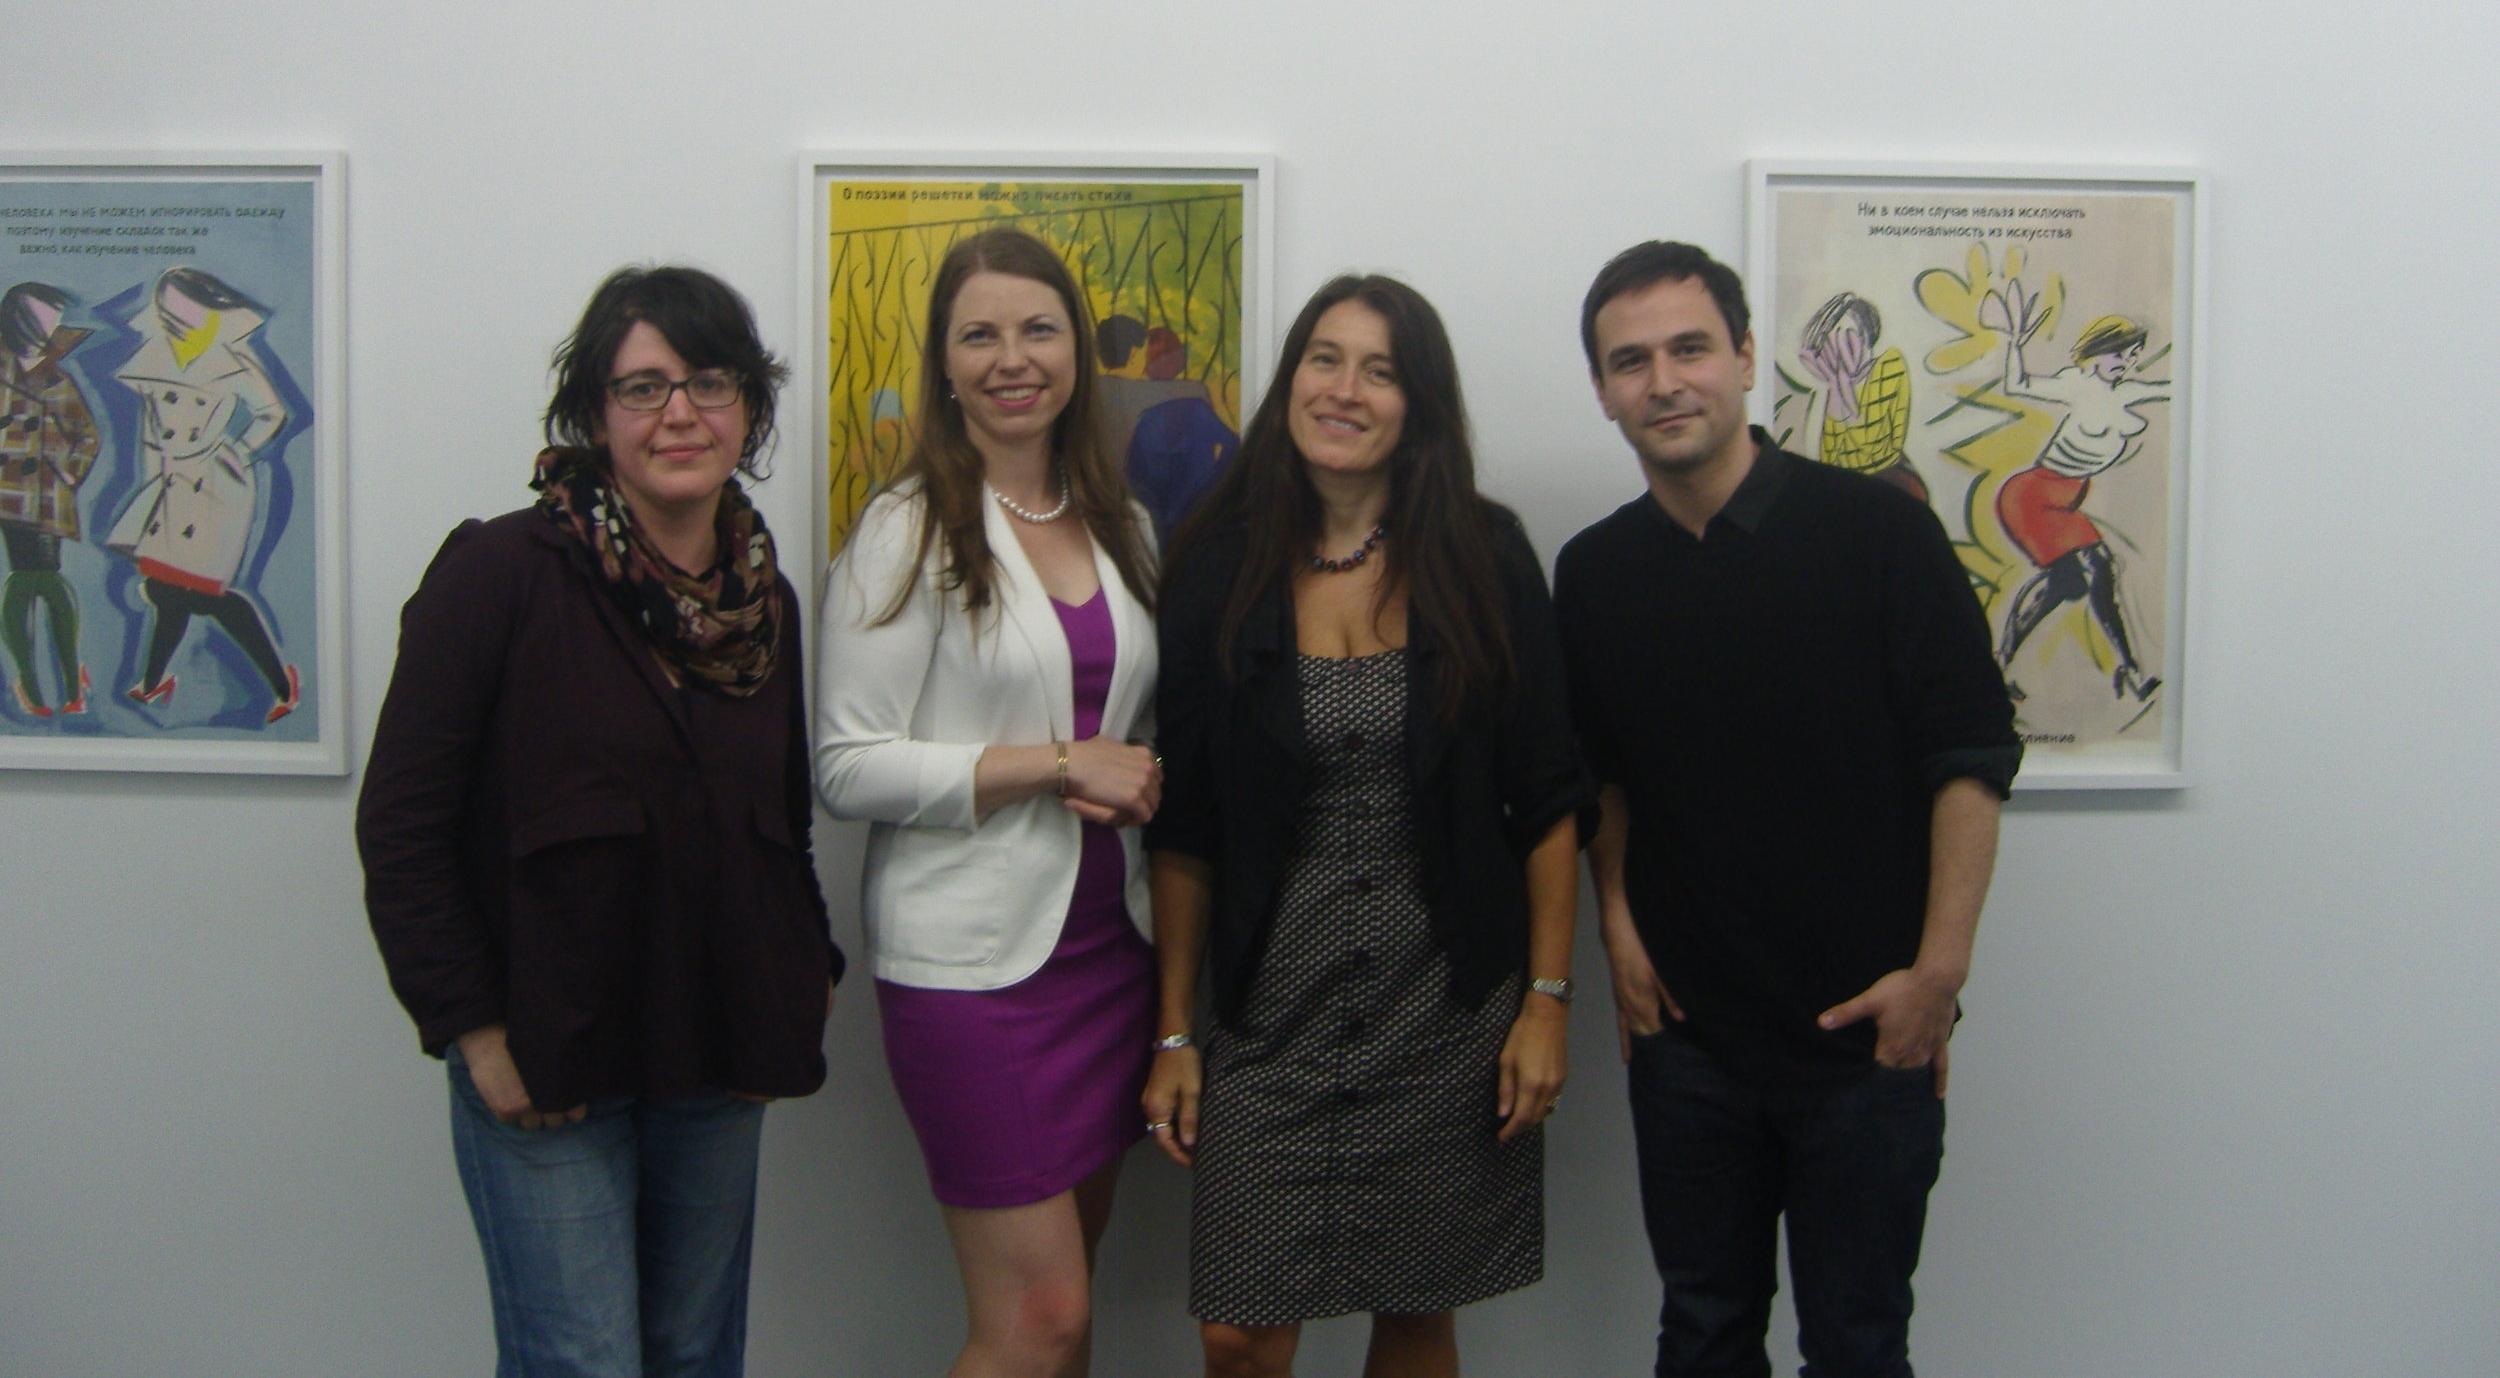 From left: Ella Kruglyanskaya, Alise Tifentale, Cristina Kiaer, and Sanya Kantarovsky in the exhibition  Little Vera.